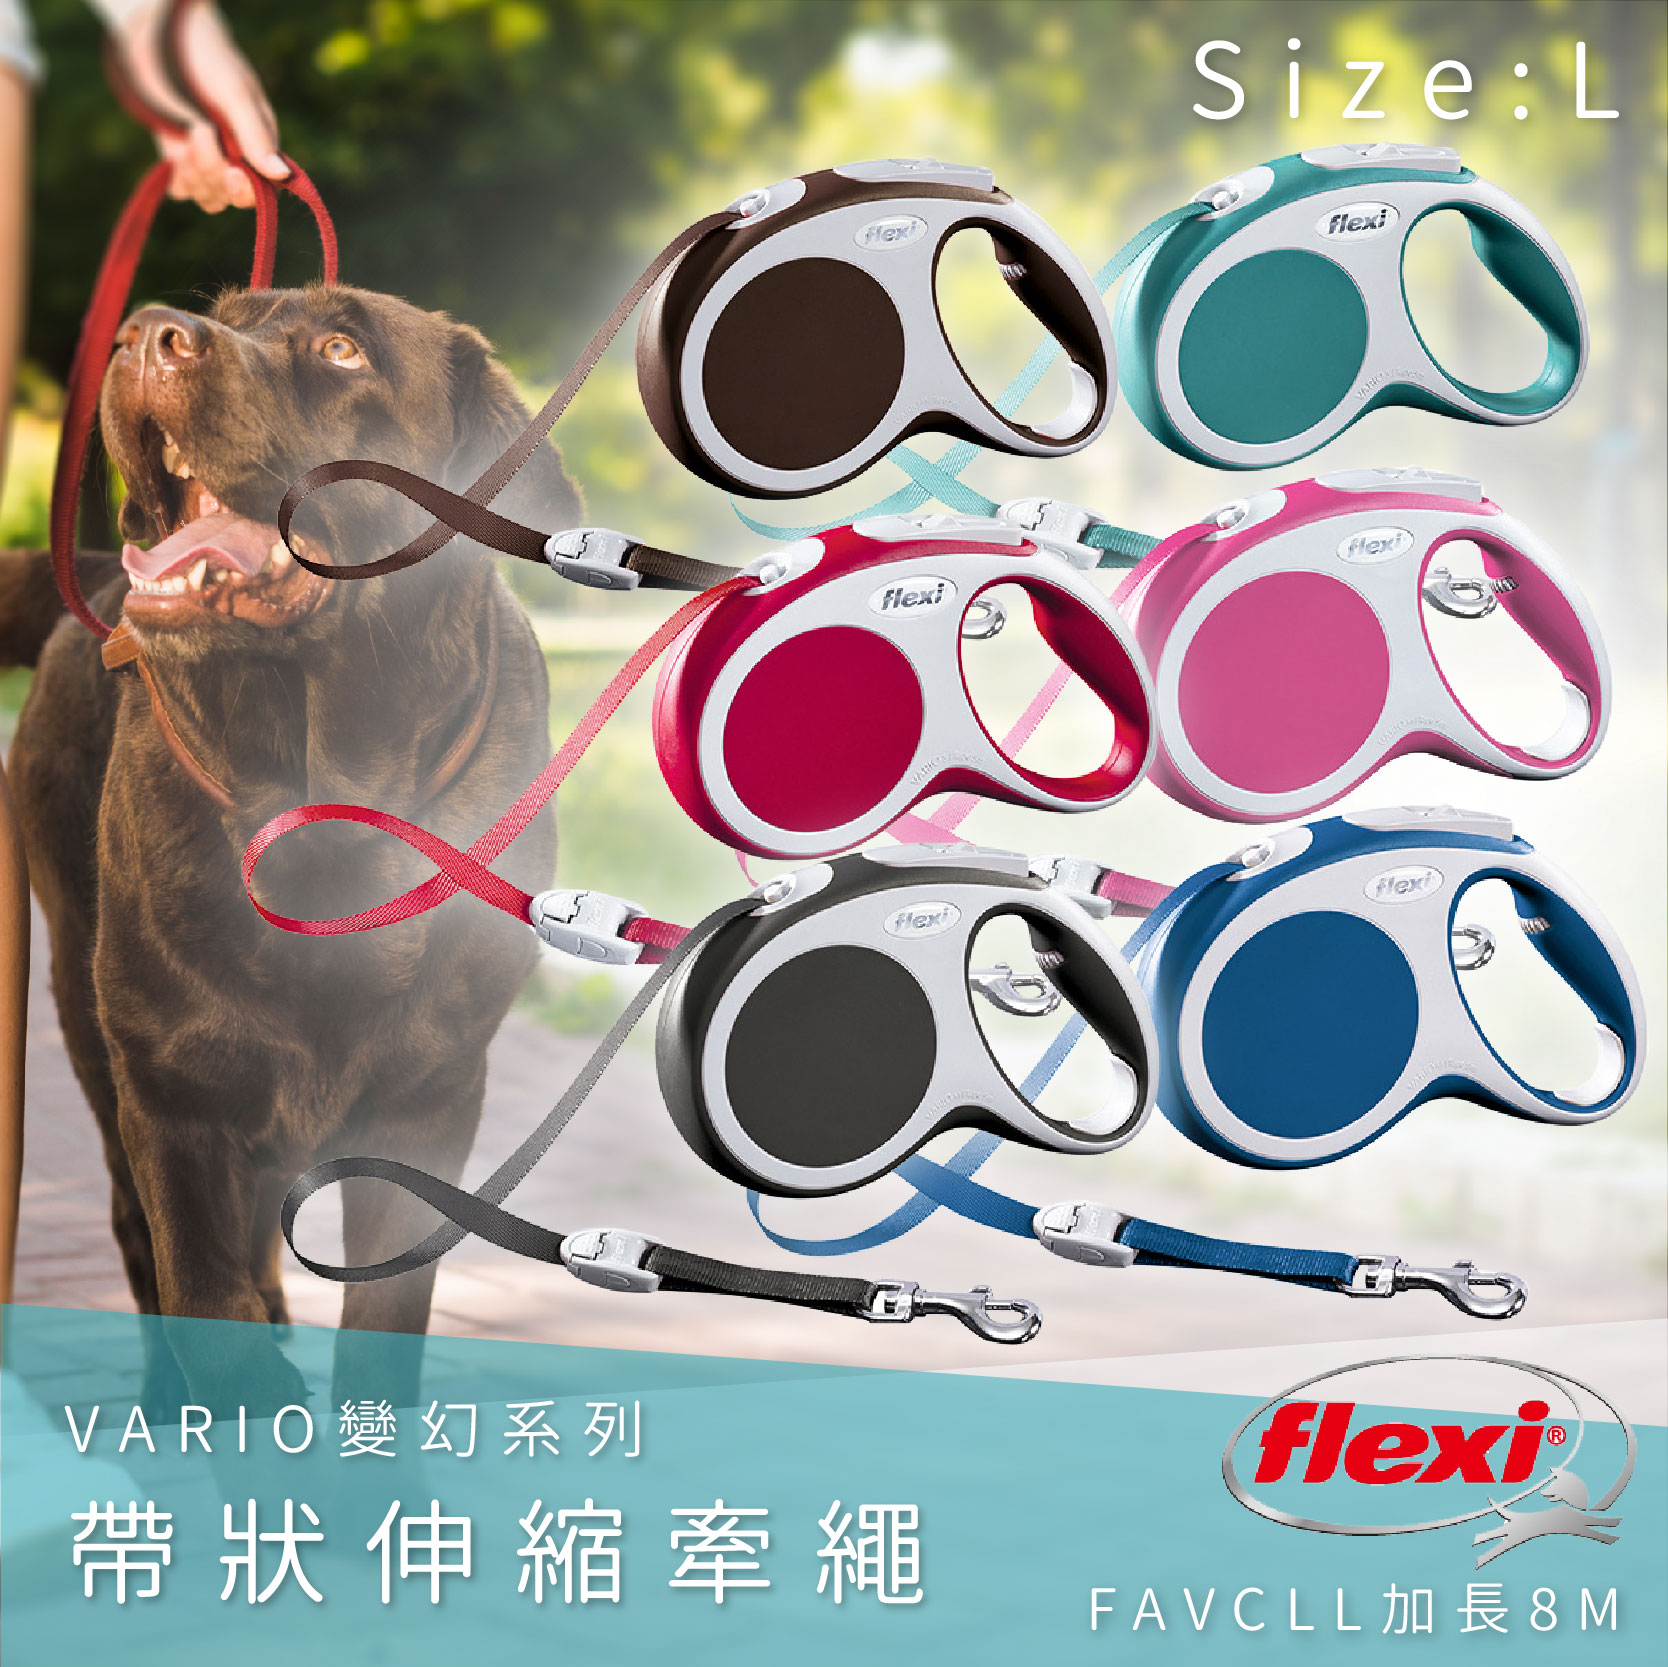 Flexi飛萊希 帶狀伸縮牽繩 L加長8米 FAVCLL 變幻系列 狗貓 外出用品 寵物用品 寵物牽繩 德國製 八色